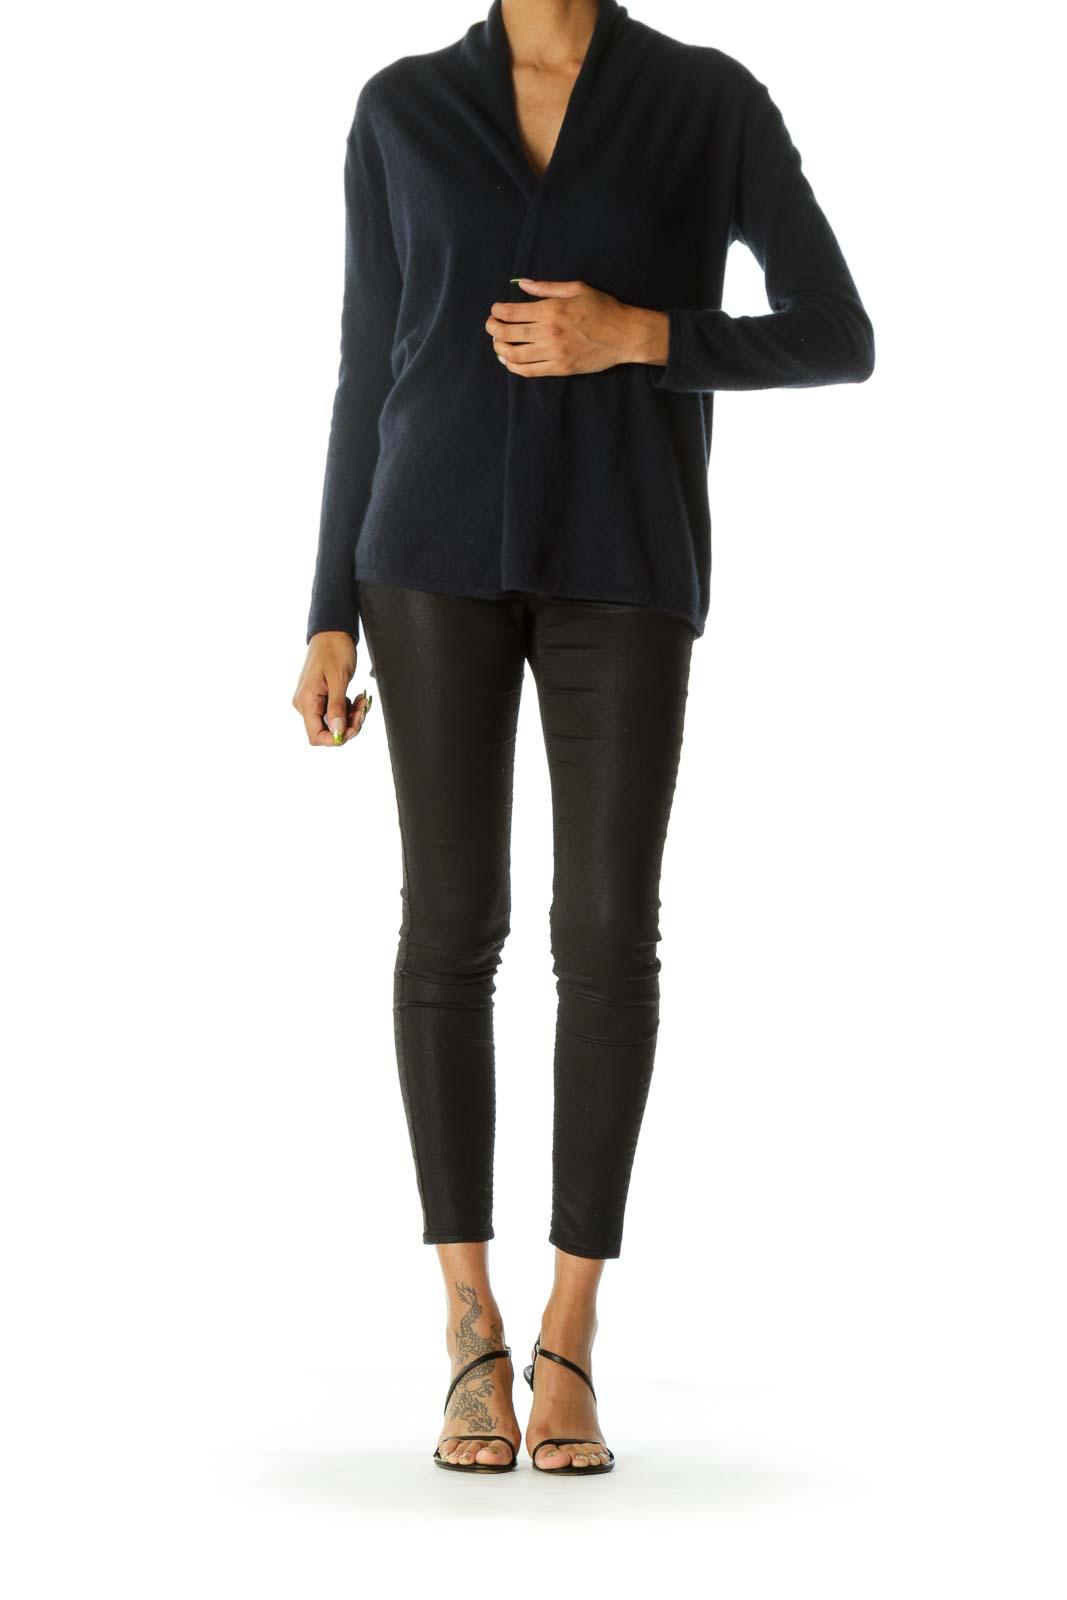 Navy Blue 100% Cashmere Open Knit Soft Cardigan